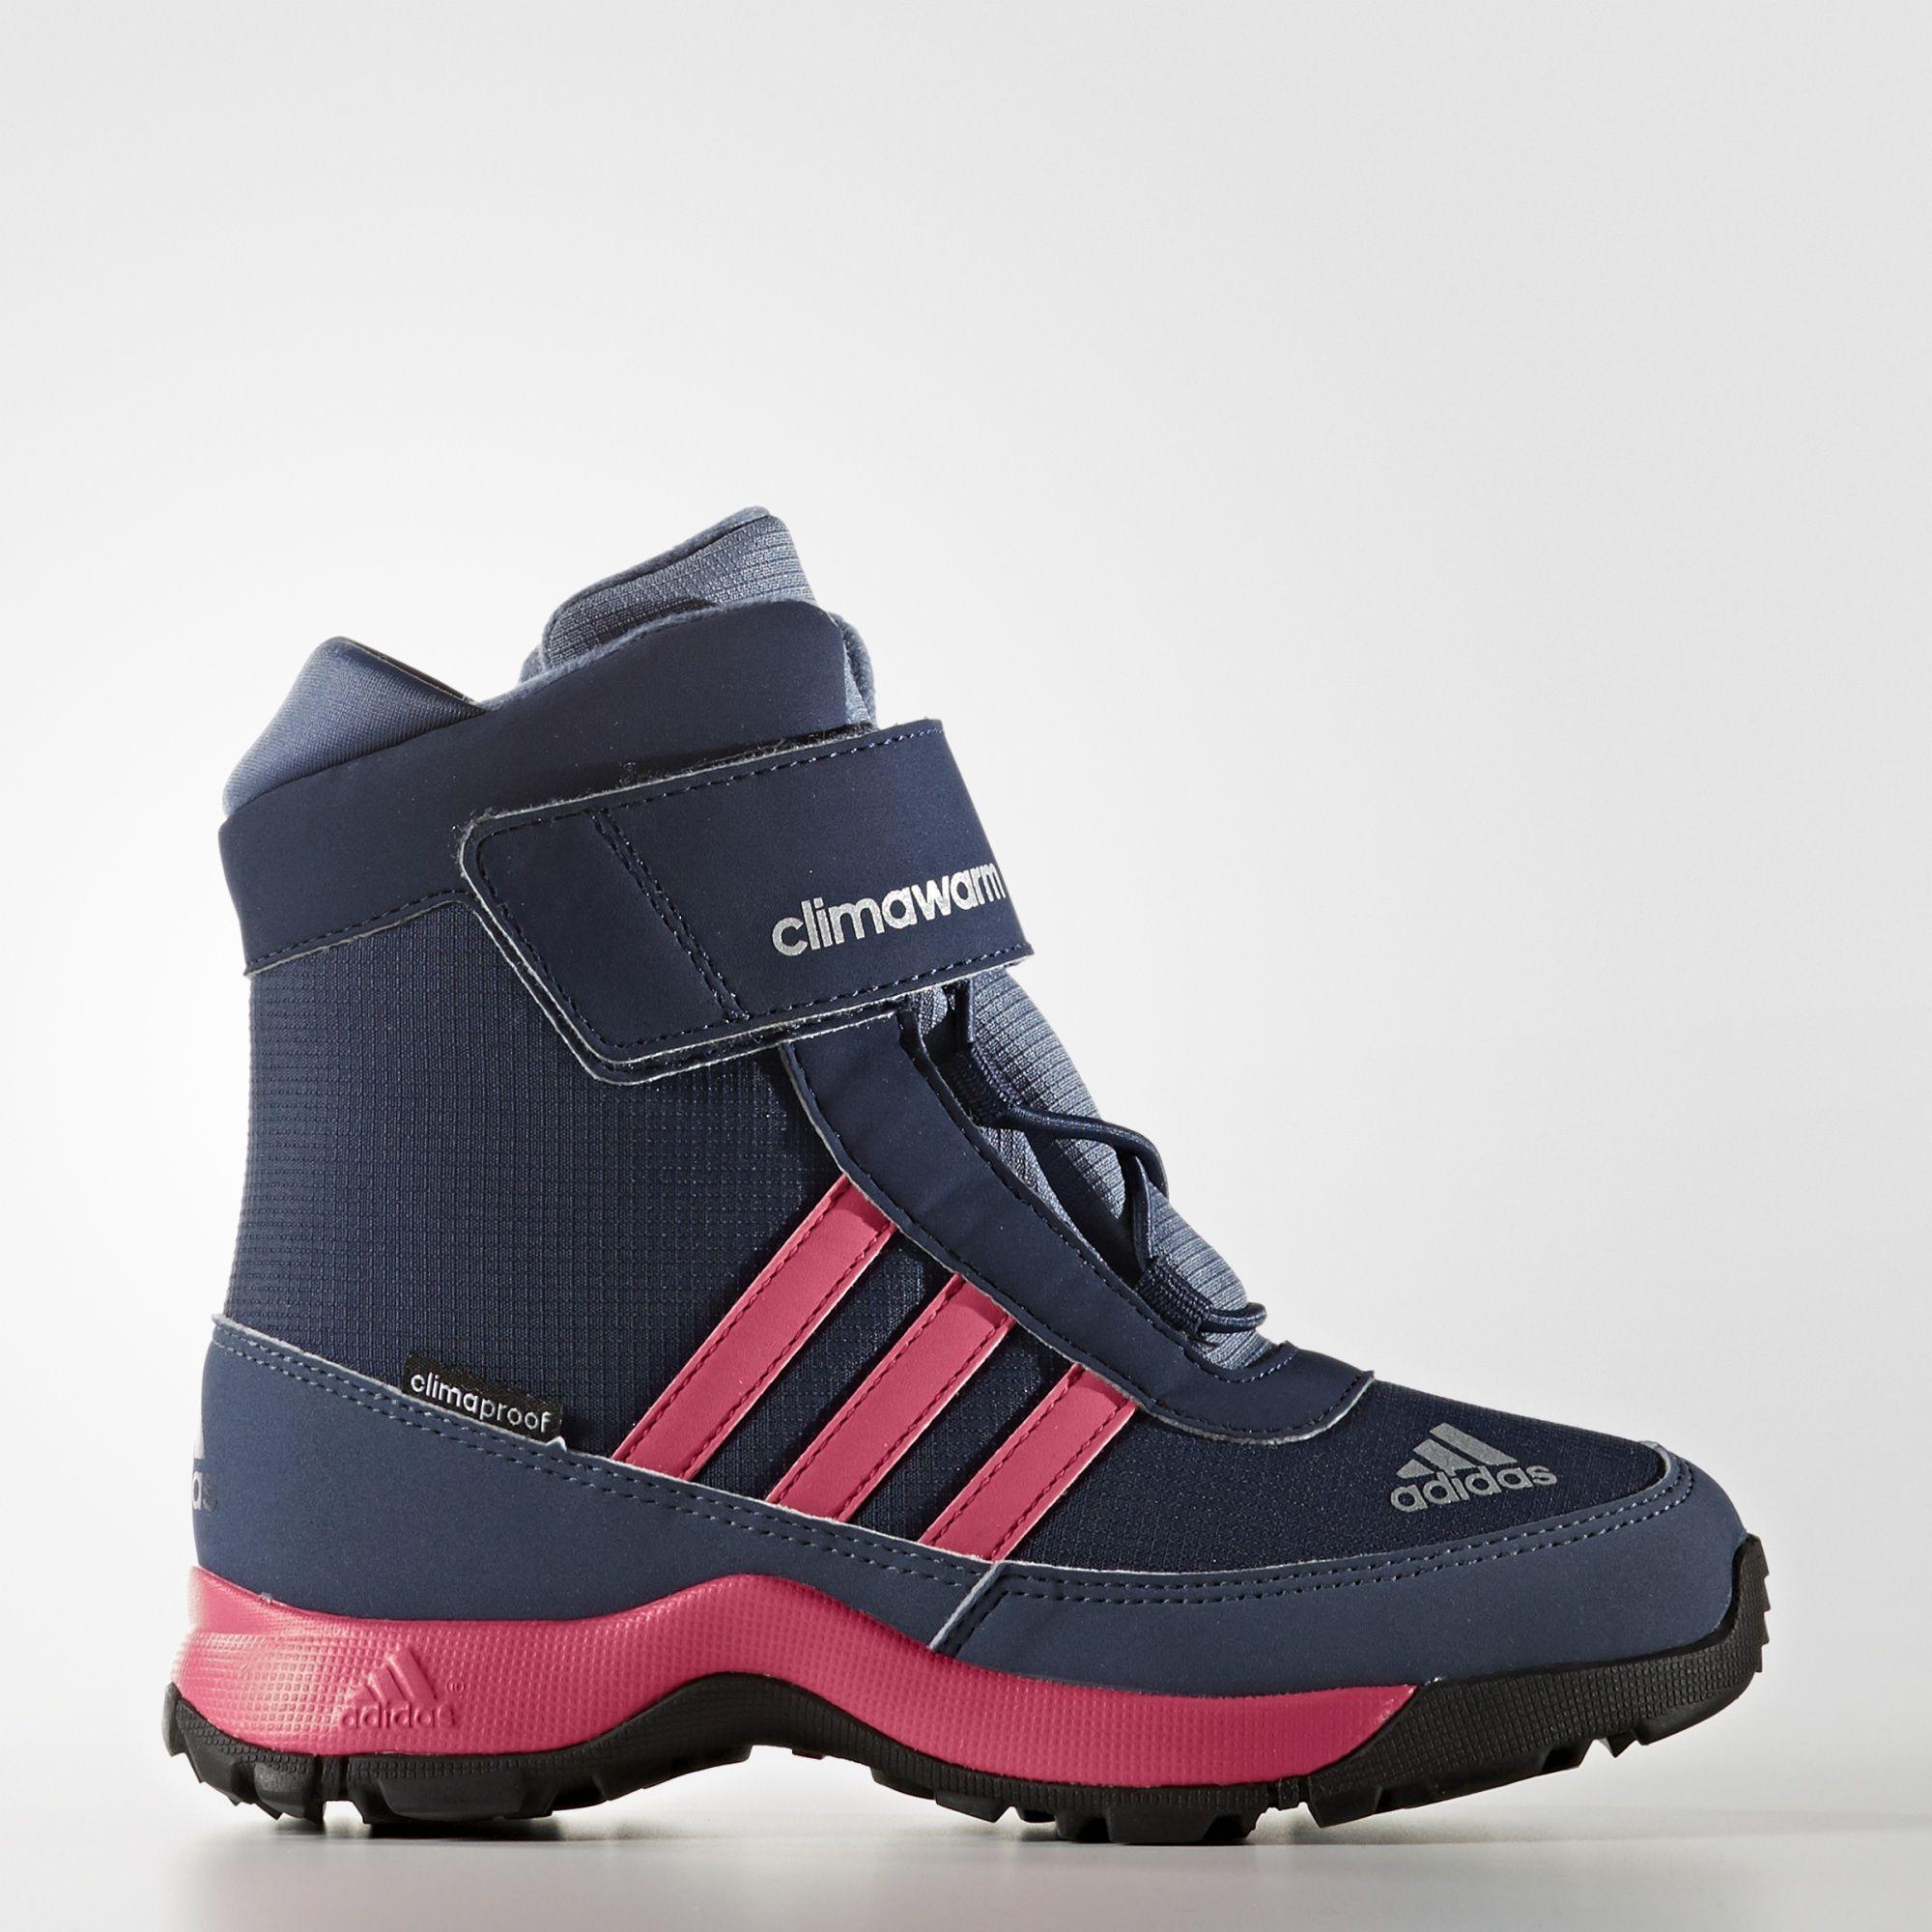 Kinder Climaheat Adisnow ClimaProof Stiefel